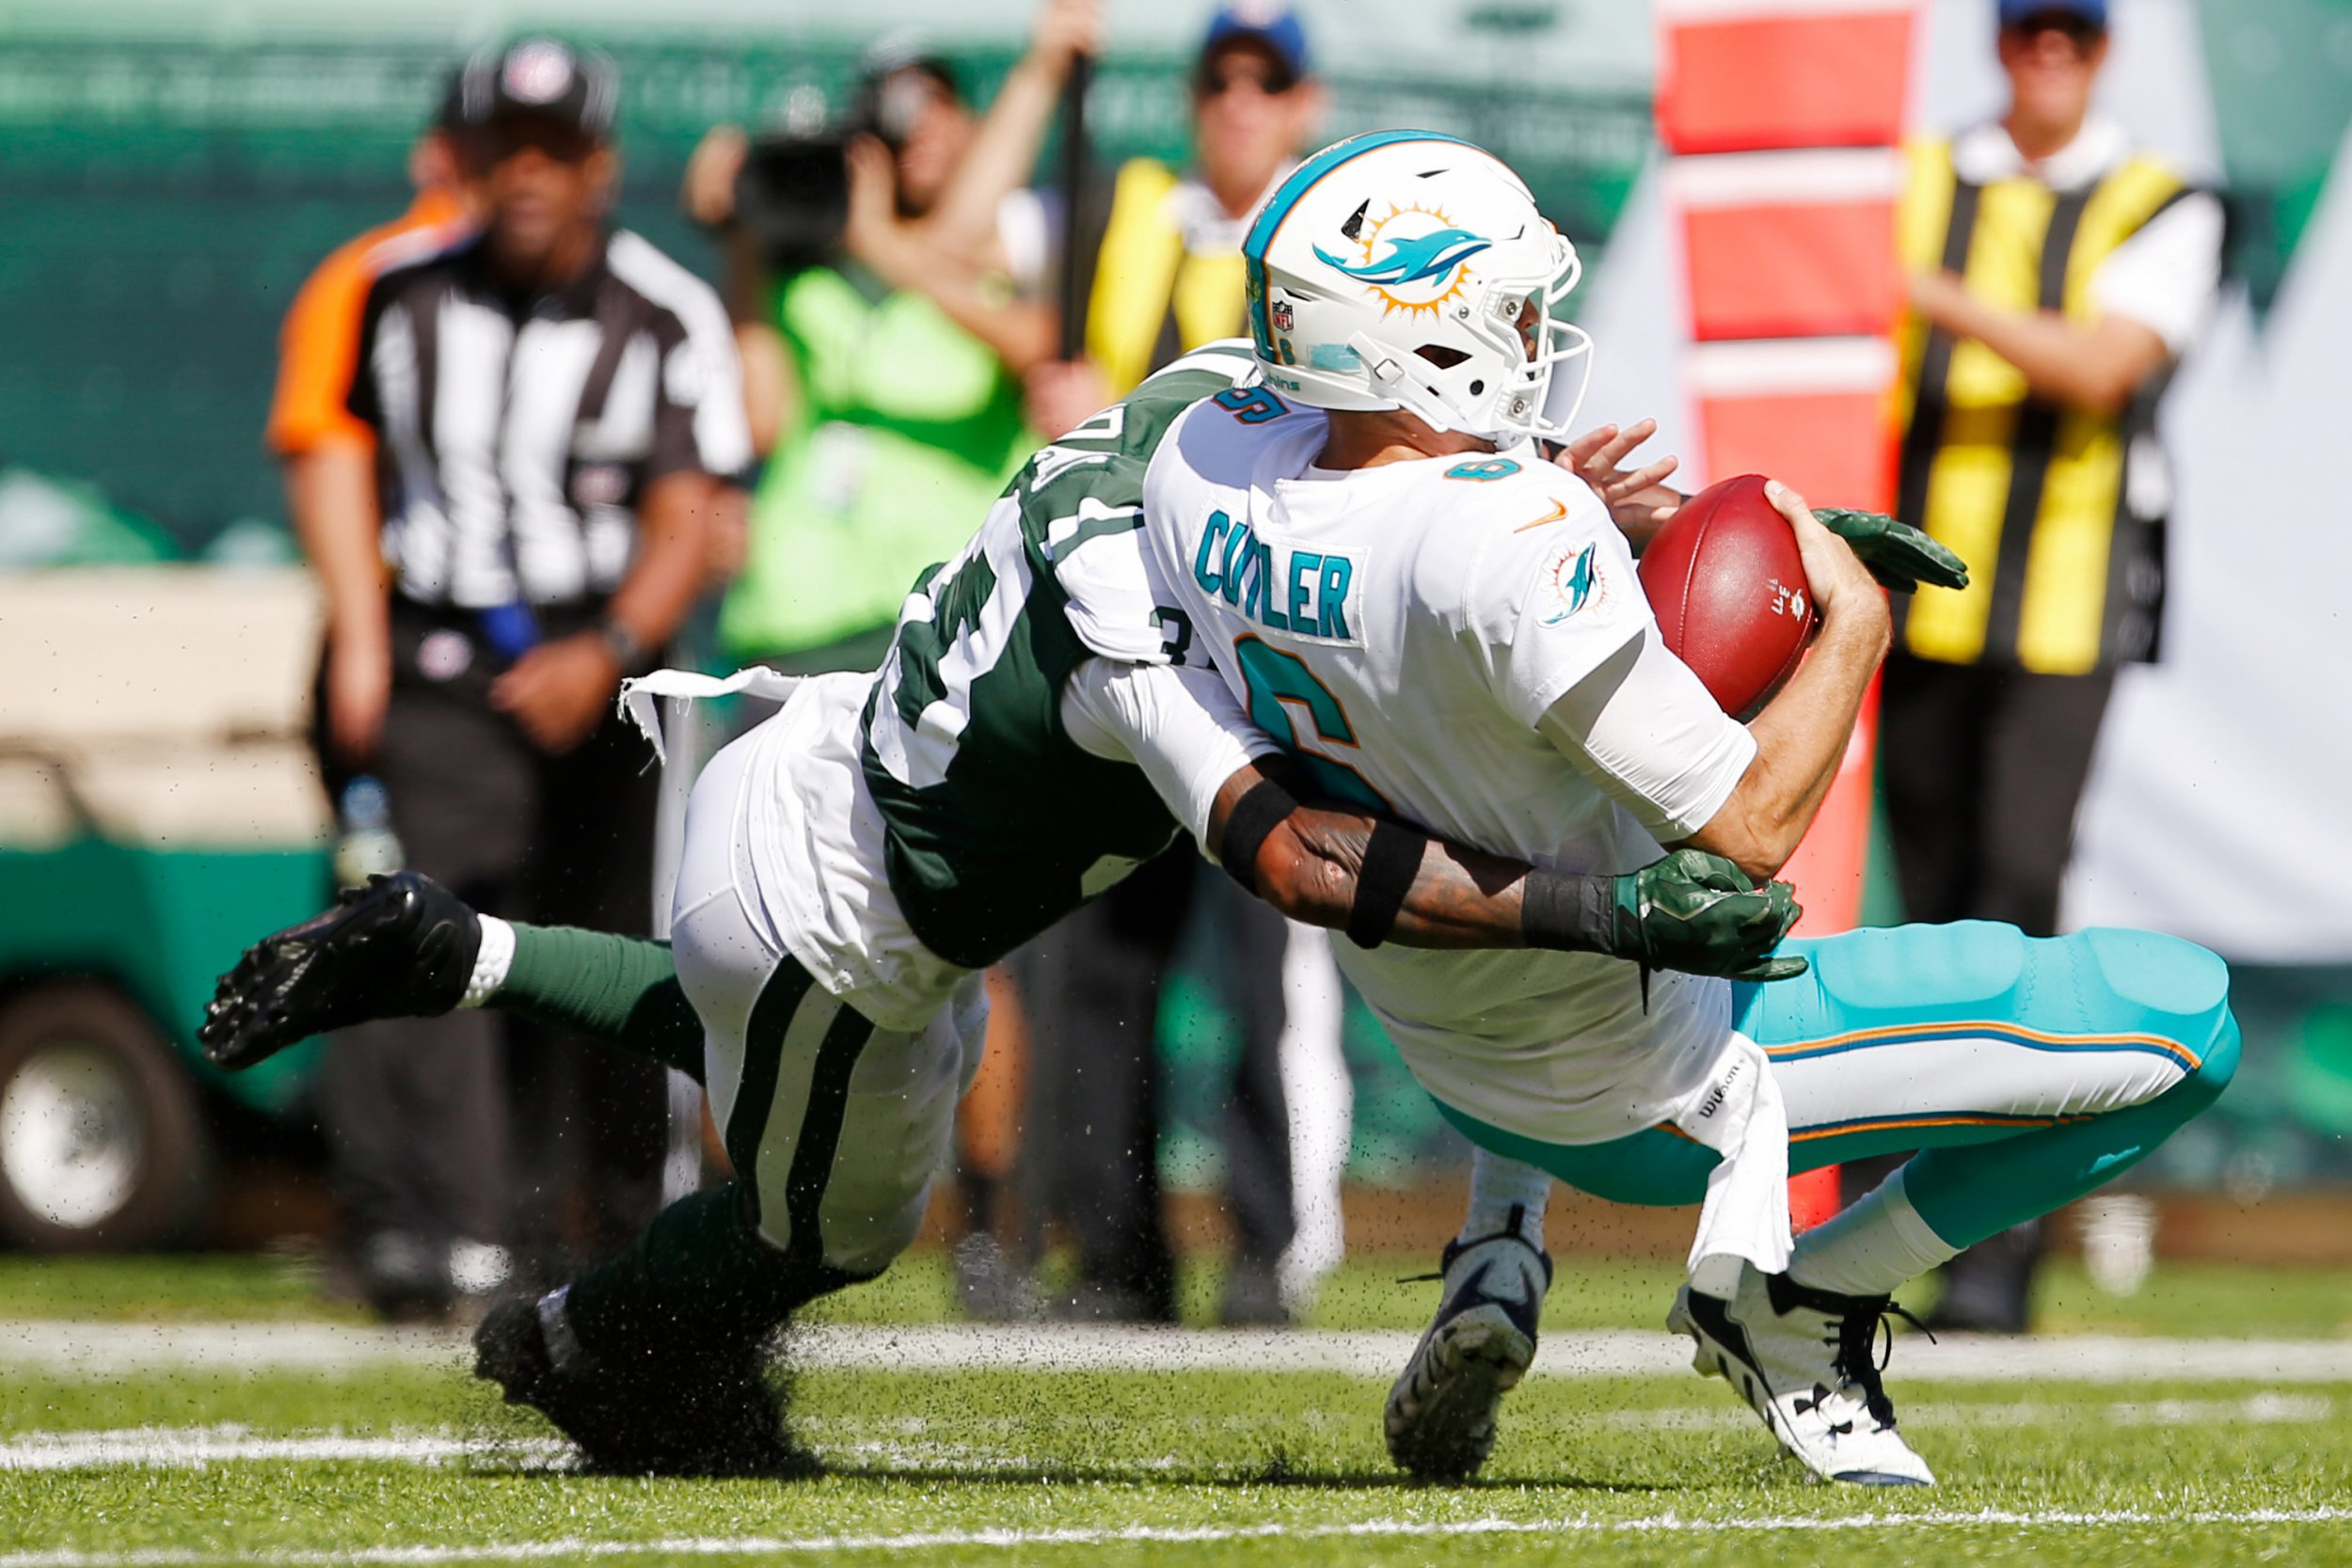 Miami Dolphins quarterback Jay Cutler, right.